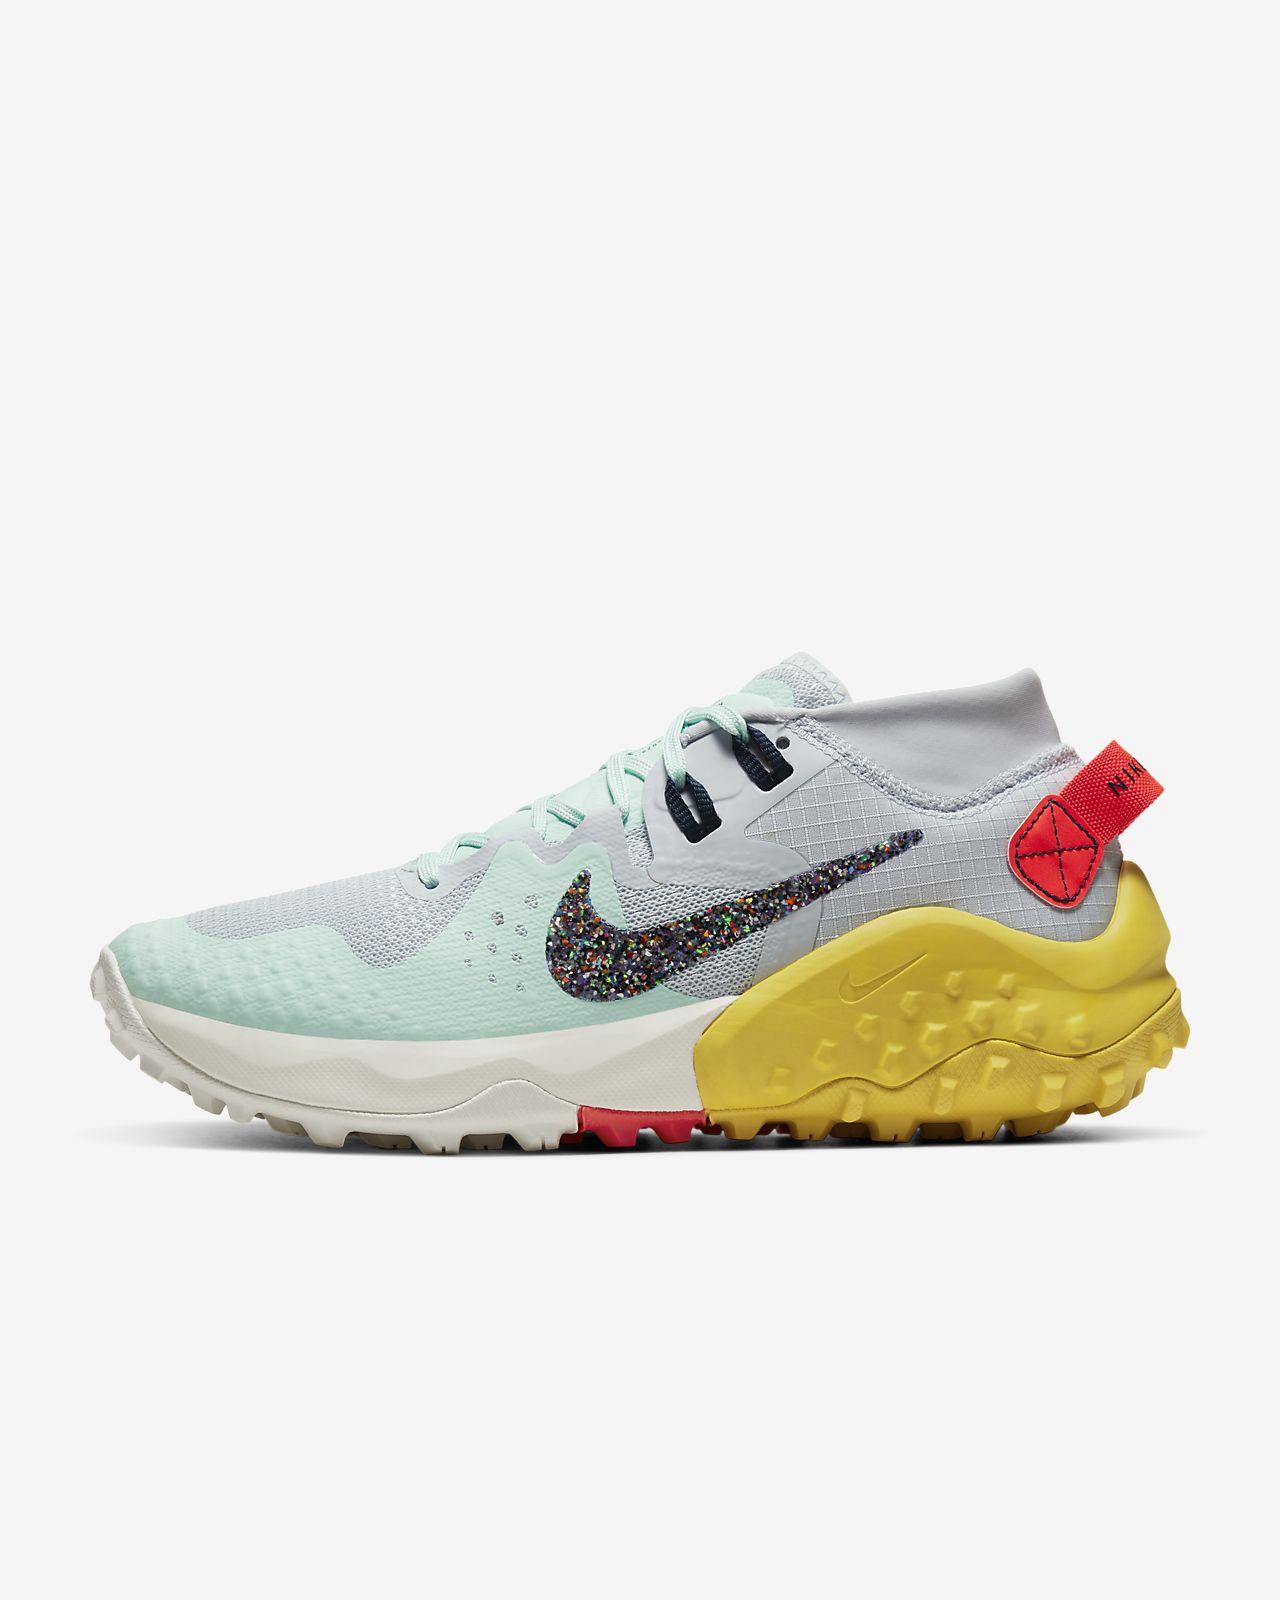 Calzado de trail running para mujer Nike Wildhorse 6